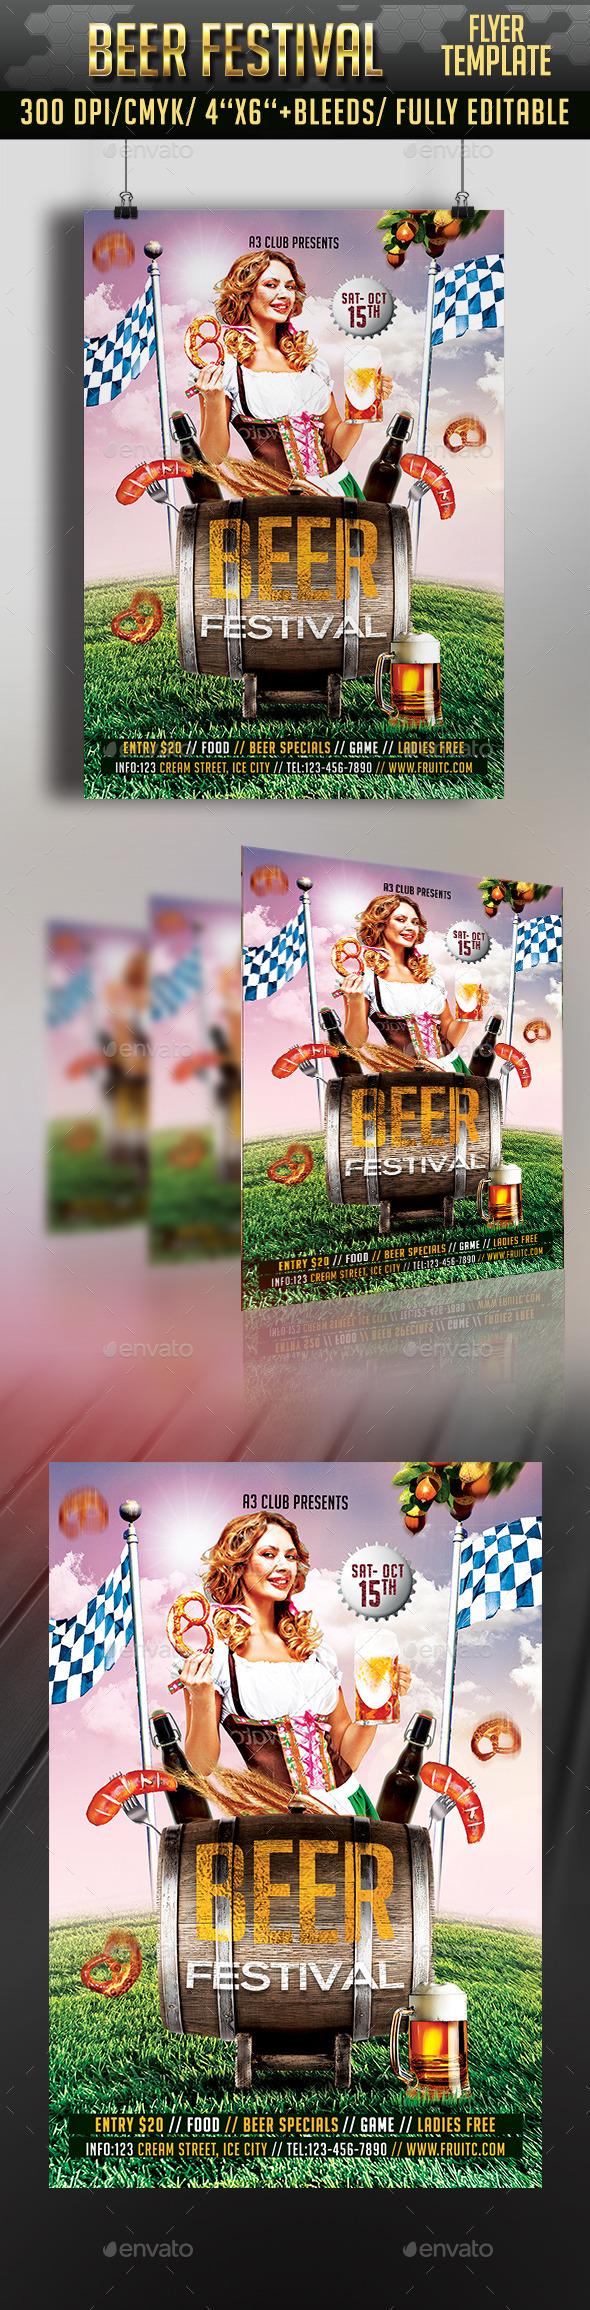 October Beer Festival Flyer - Clubs & Parties Events